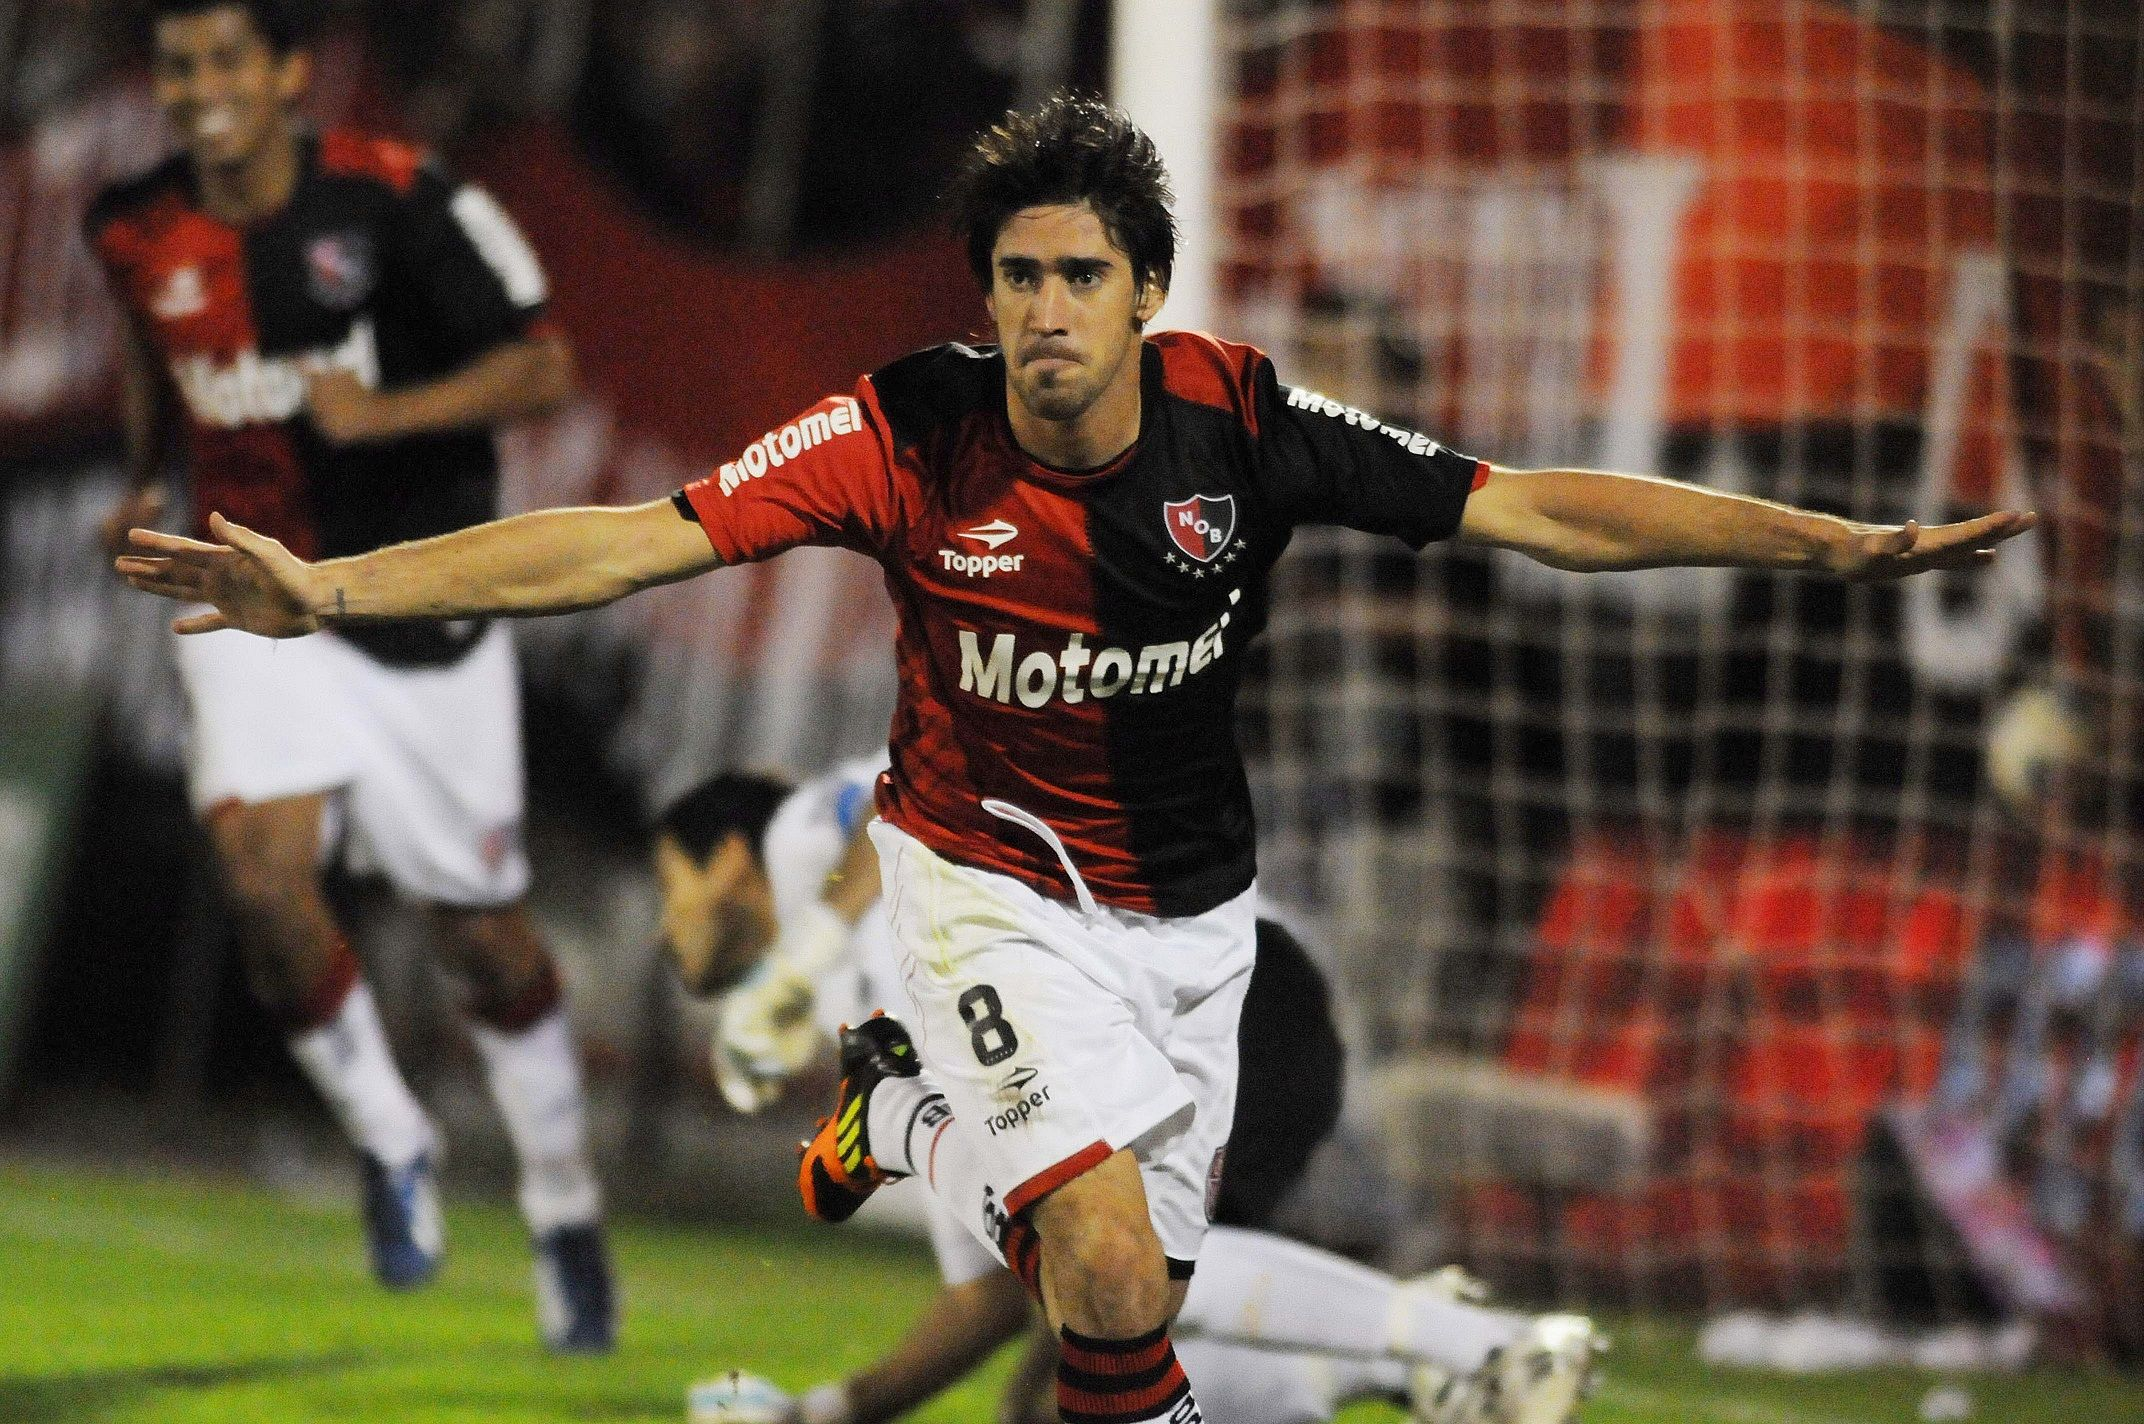 Es oficial: Pablo Pérez deja Independiente y vuelve a Newells